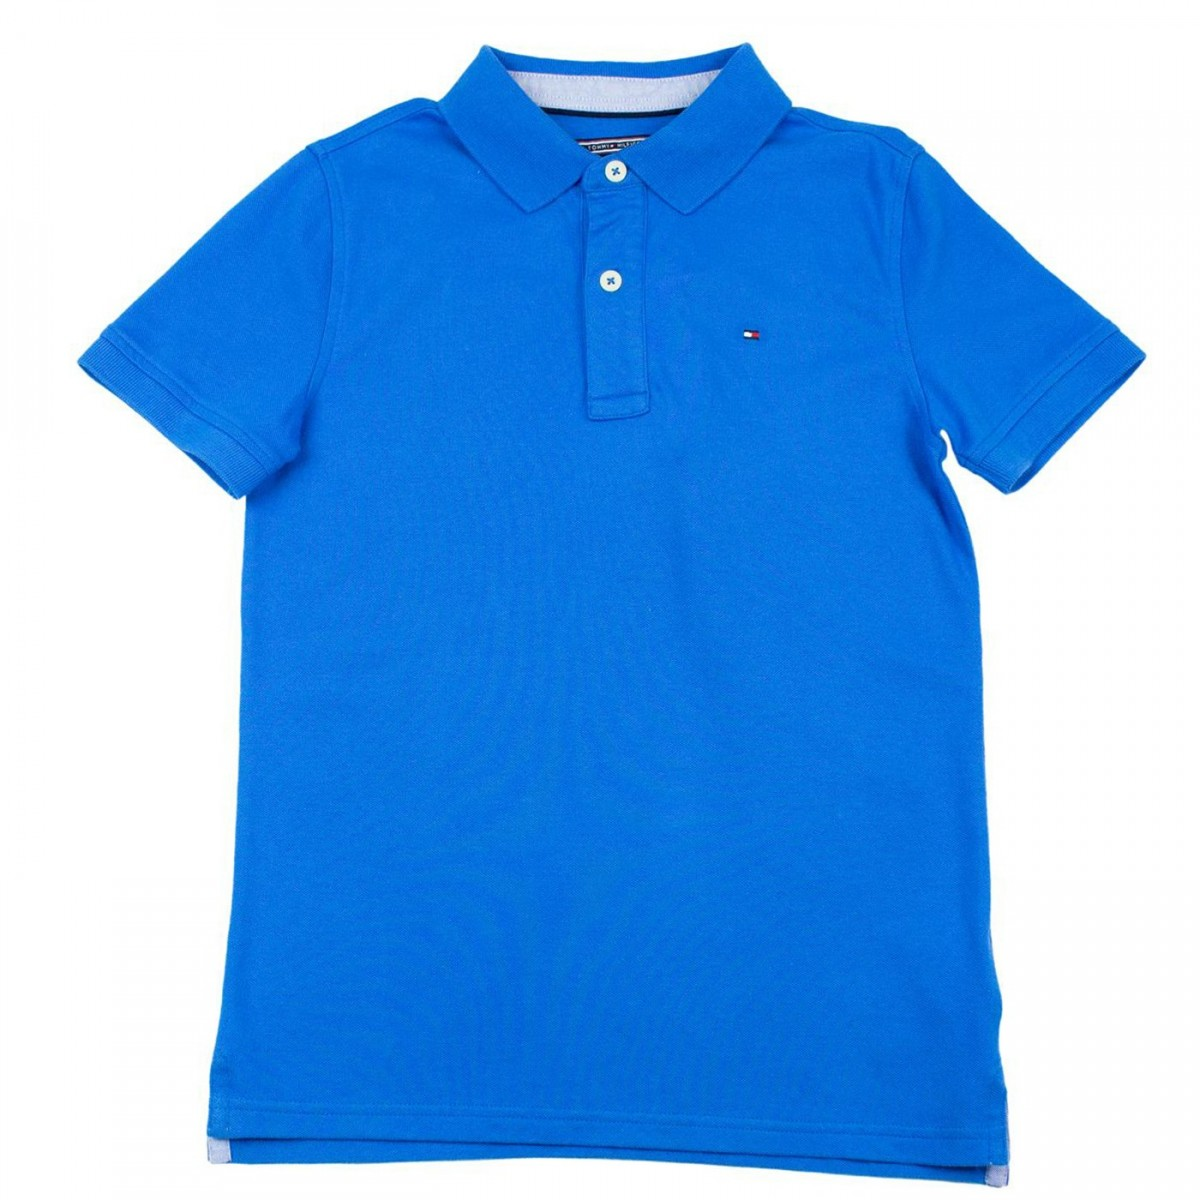 Bizz Store - Camisa Polo Infantil Masculina Tommy Hilfiger 6d5b1070094b7